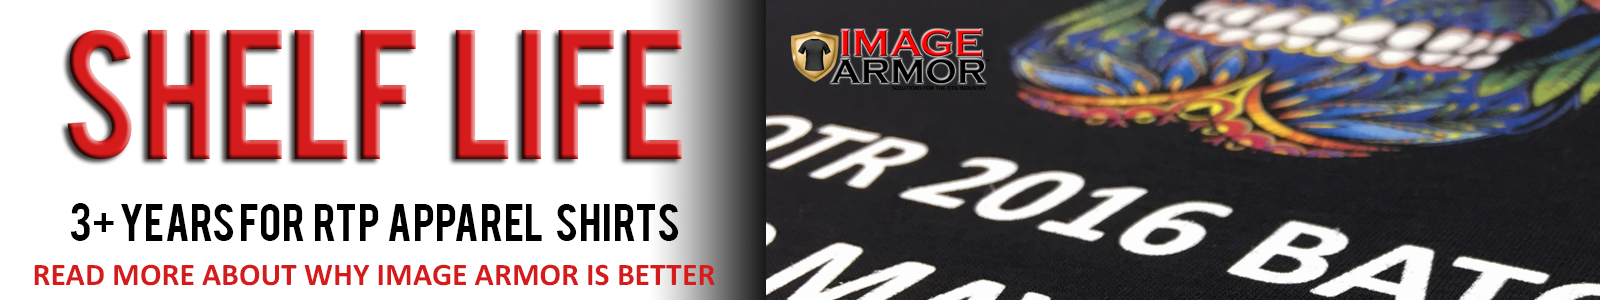 Image Armor RTP Apparel 3 Year Shelf Life